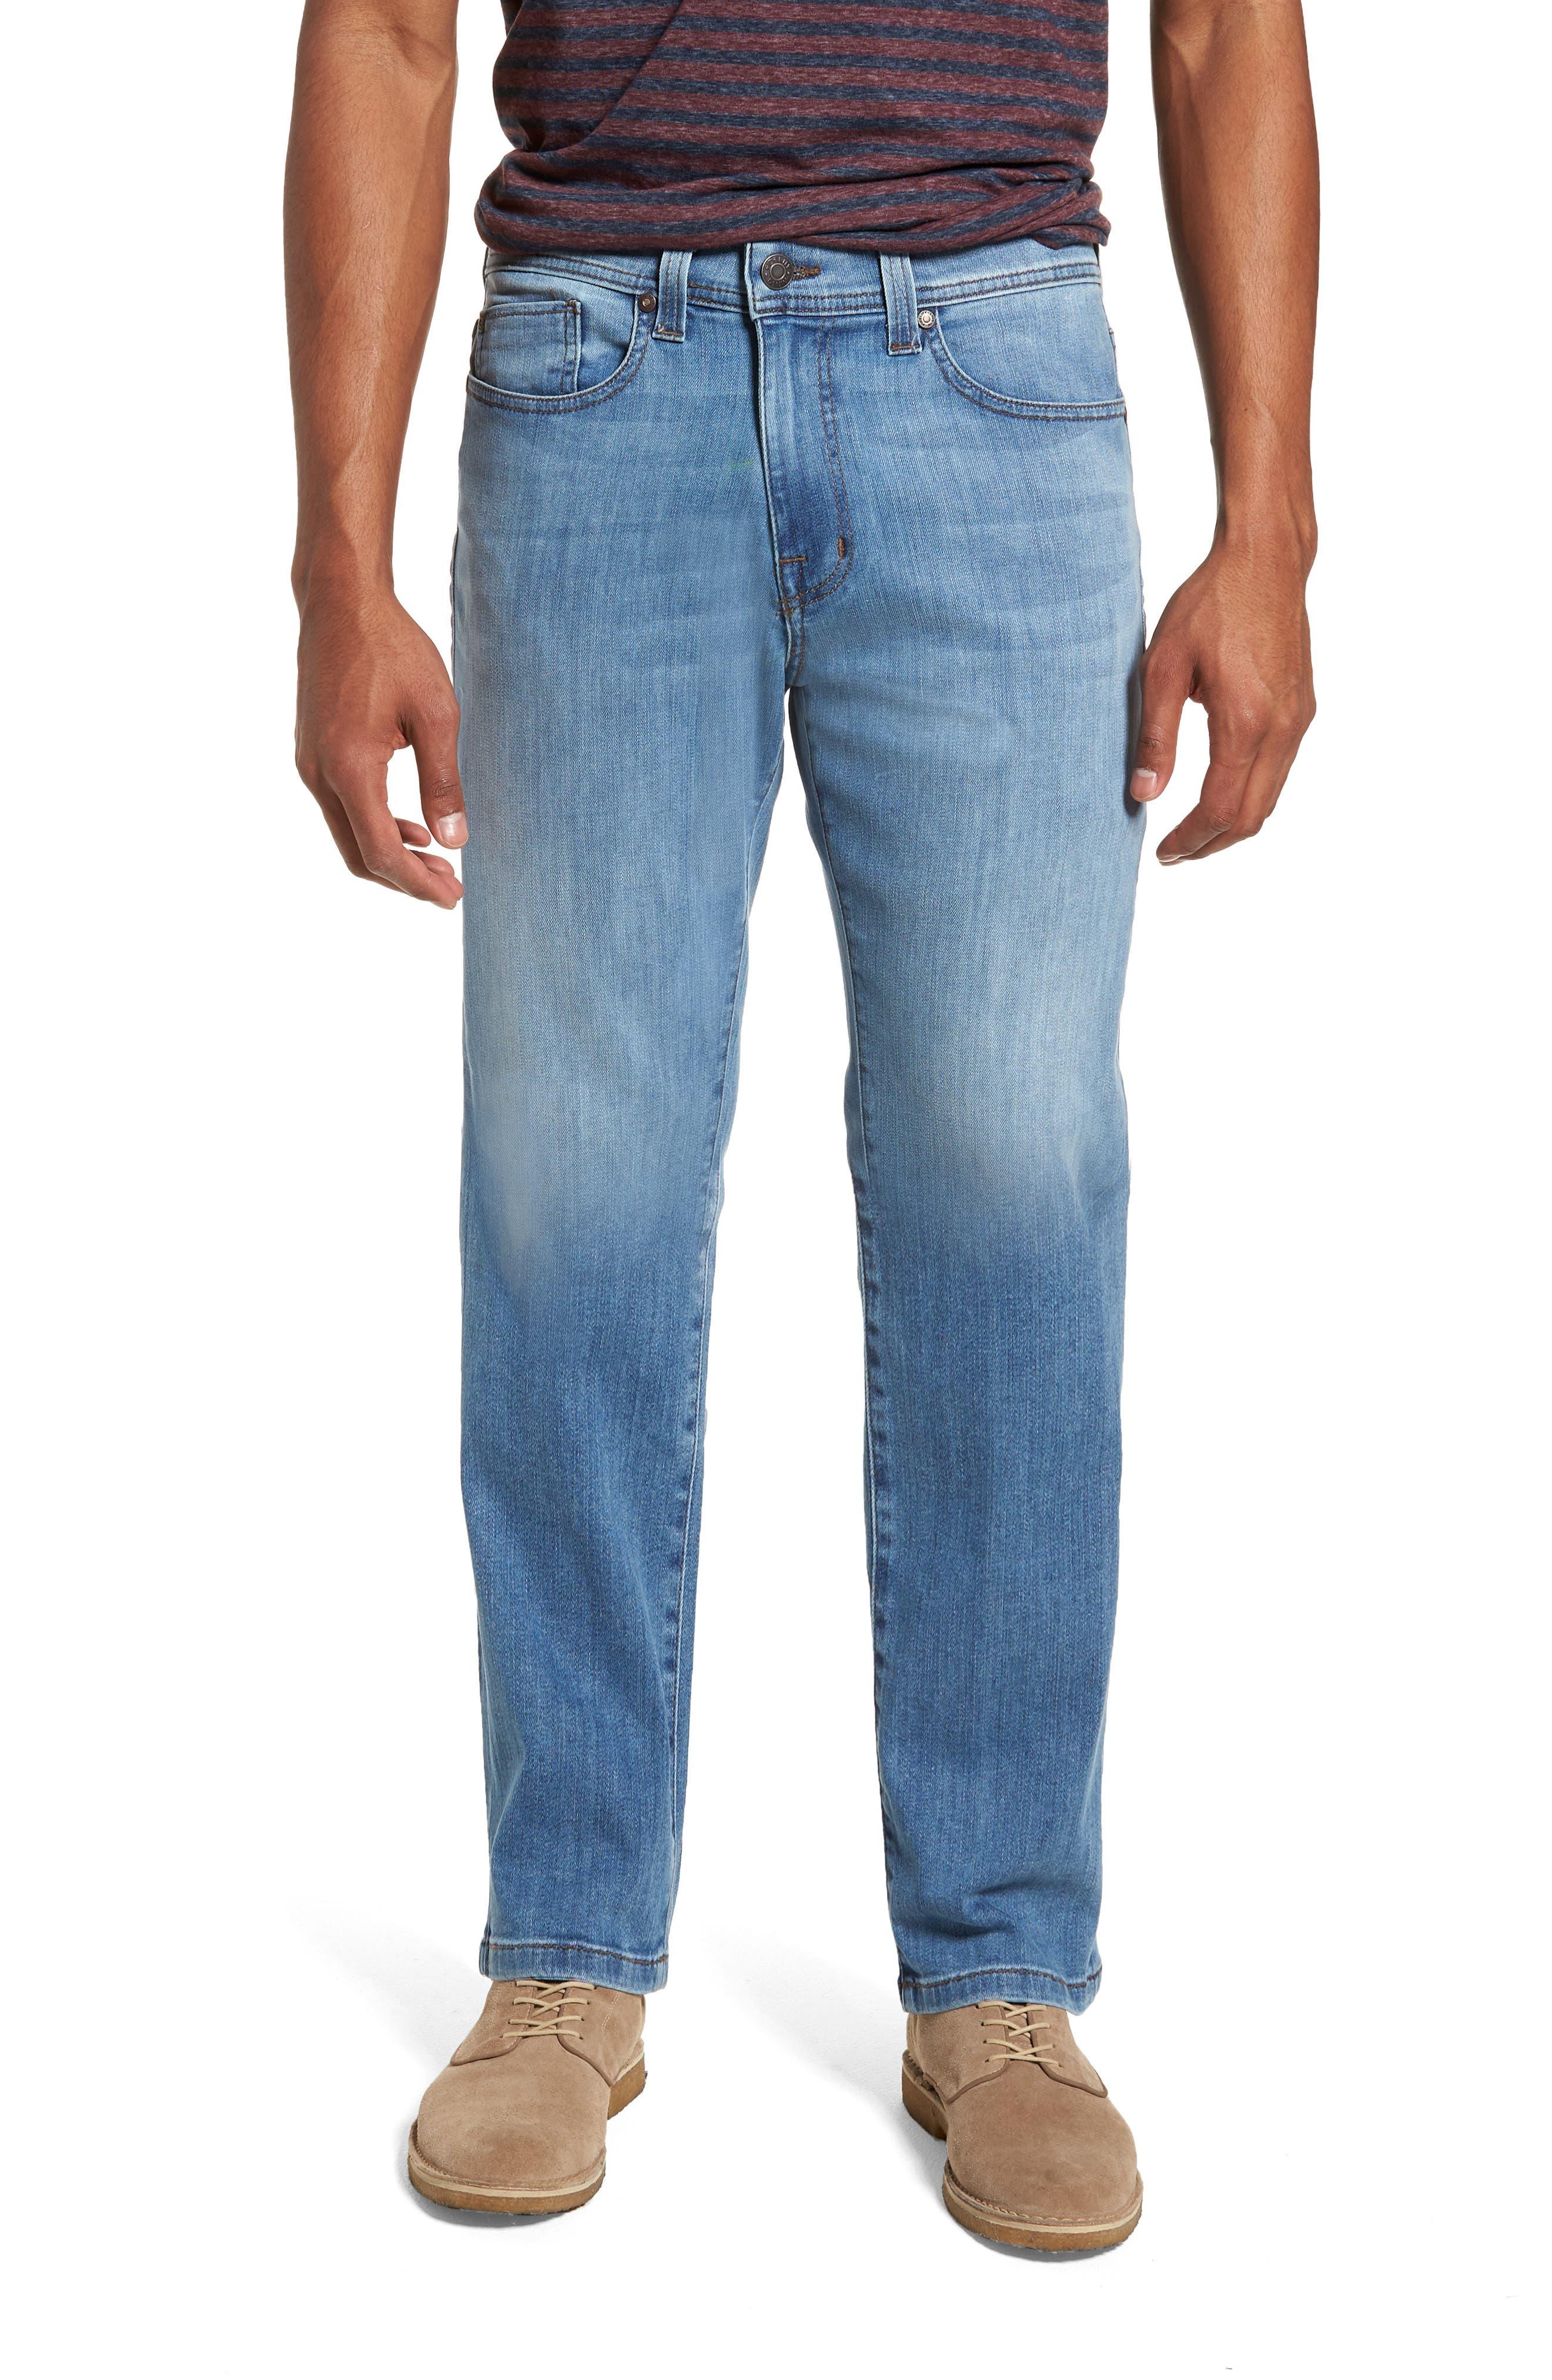 Jimmy Slim Straight Fit Jeans,                         Main,                         color, Brixton Blue